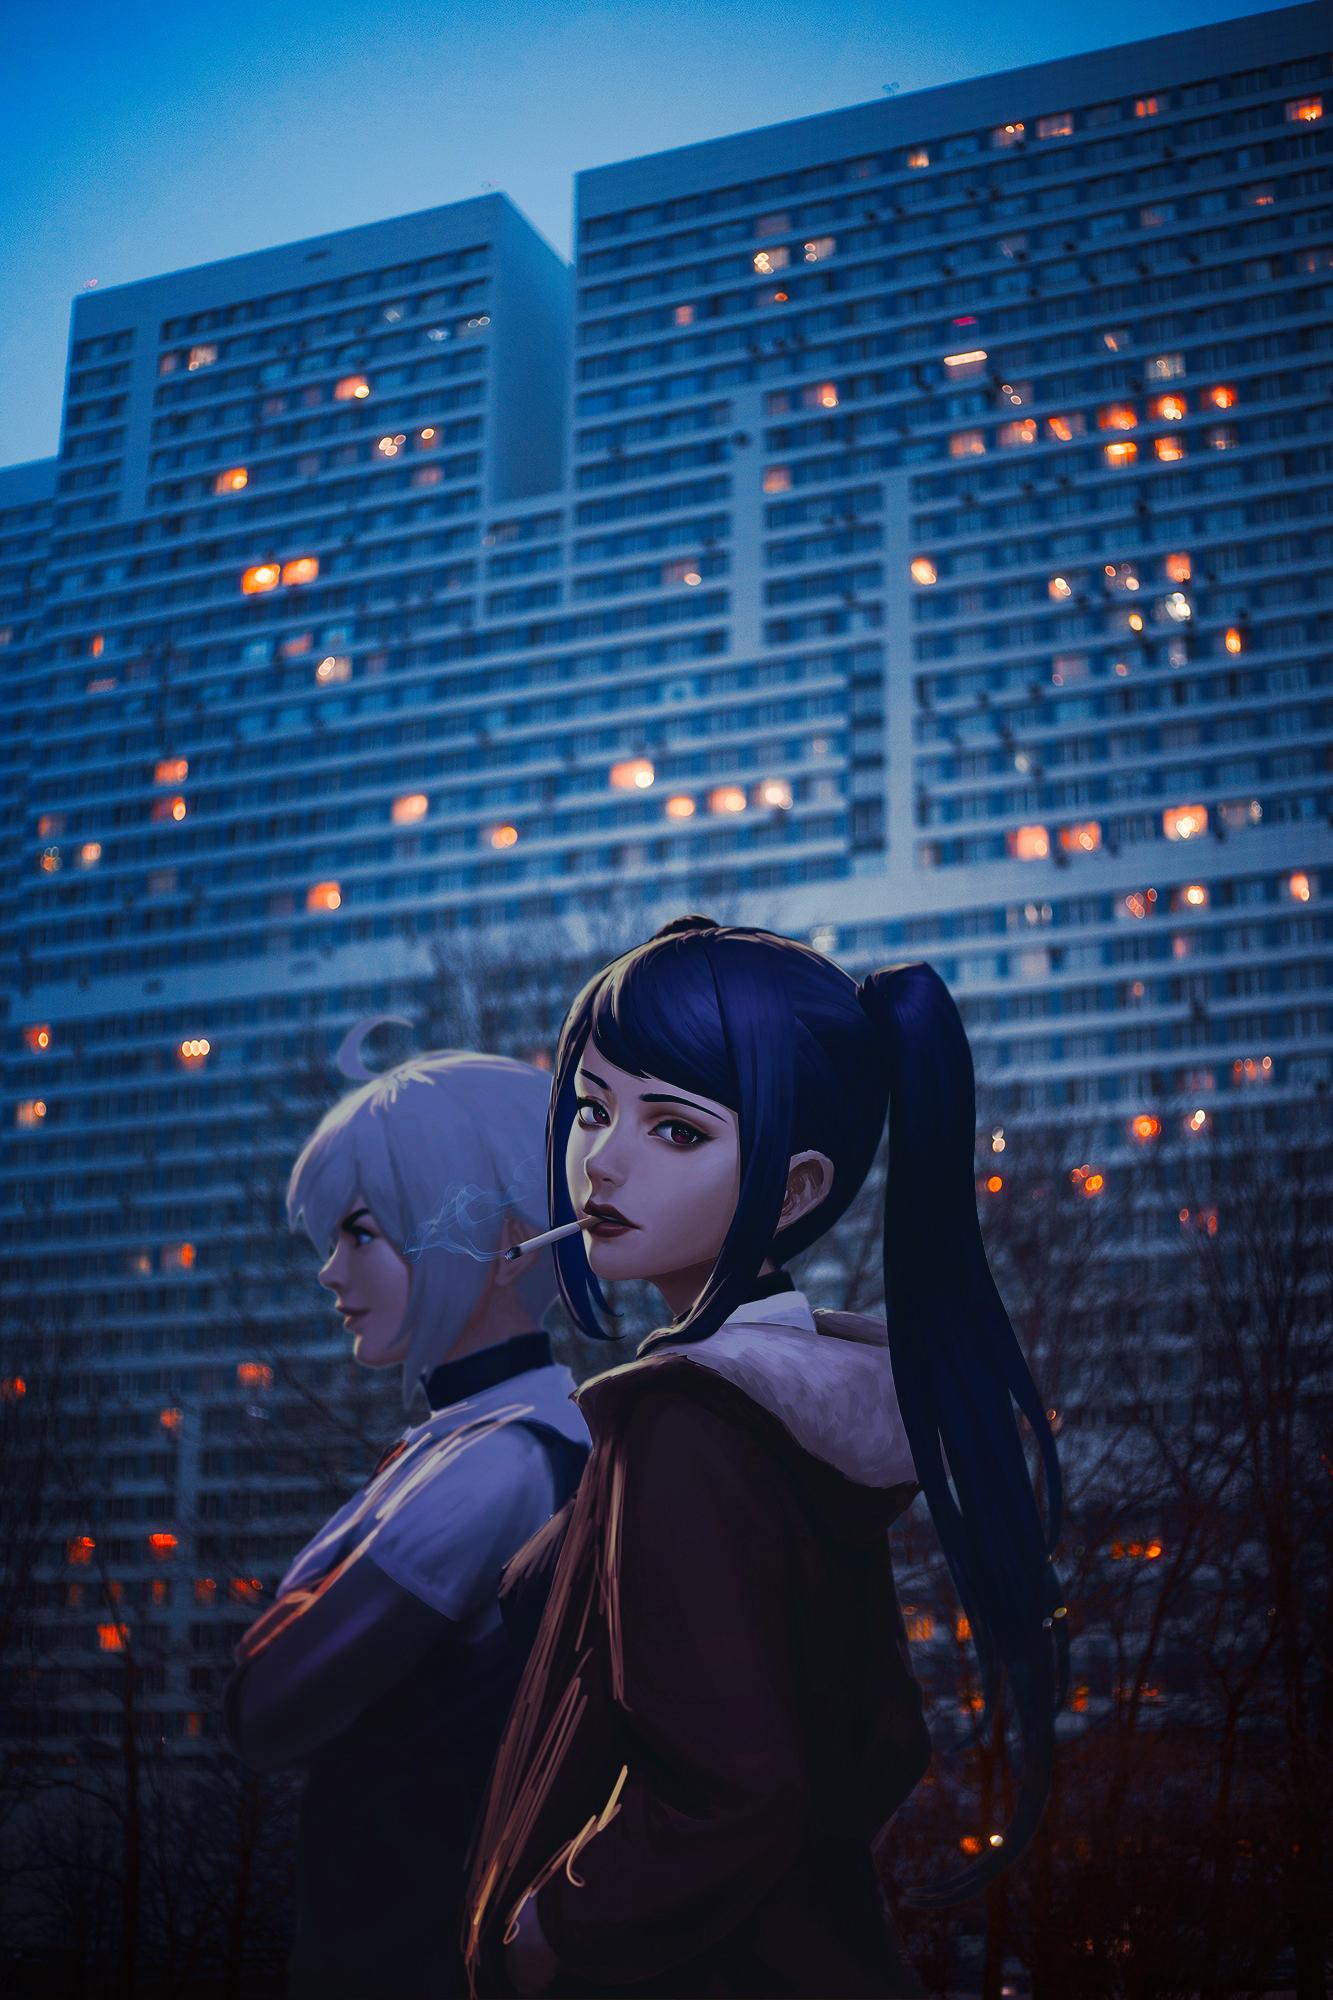 Anime 1333x2000 va-11 hall-a anime 2D Russia red eyes blue hair cigarettes hands in pockets lipstick smoking Julianne Stingray Dana Zane